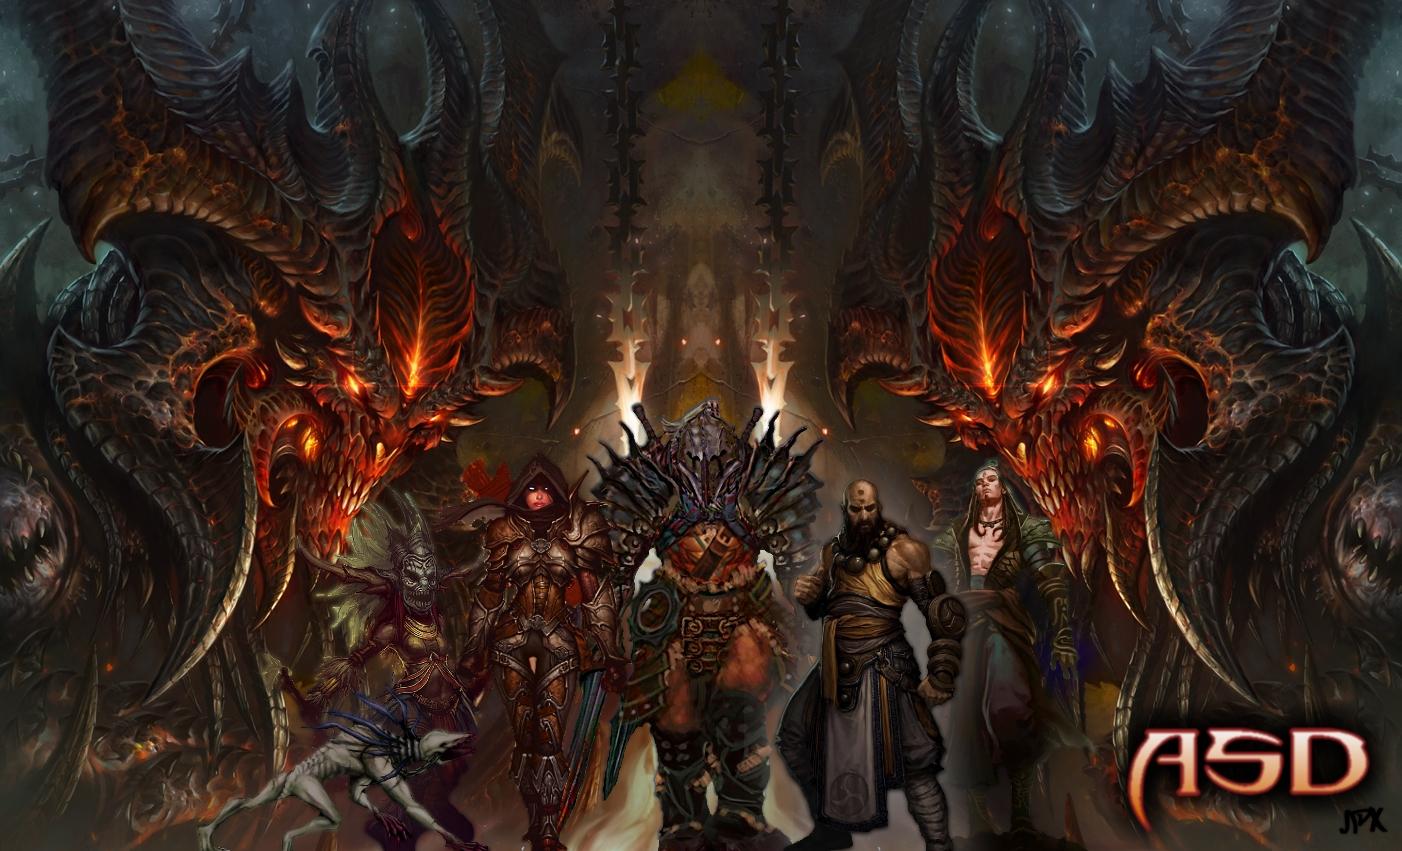 http://1.bp.blogspot.com/-cyu4DtoIg9U/T7EmAT2LUOI/AAAAAAAAAU0/zsI2Nihie-A/s1600/asd-background2.jpg